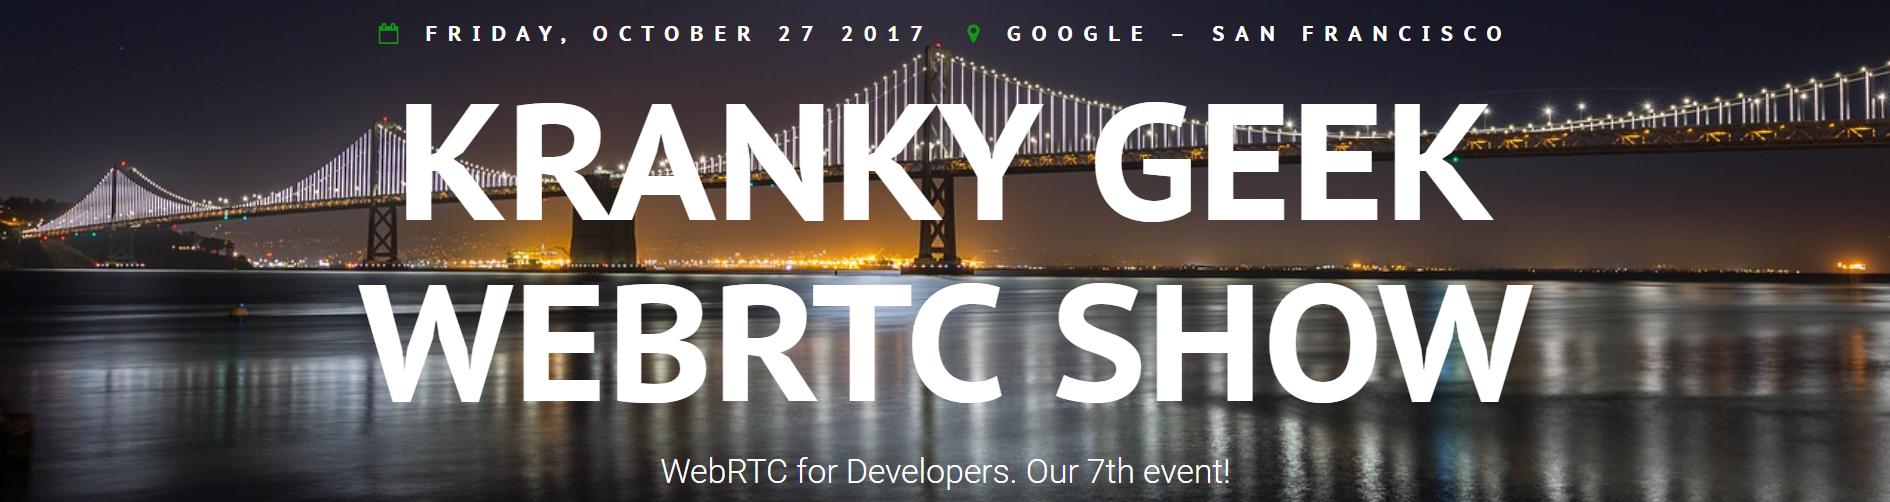 Kranky Geek WebRTC 2017 - San Francisco